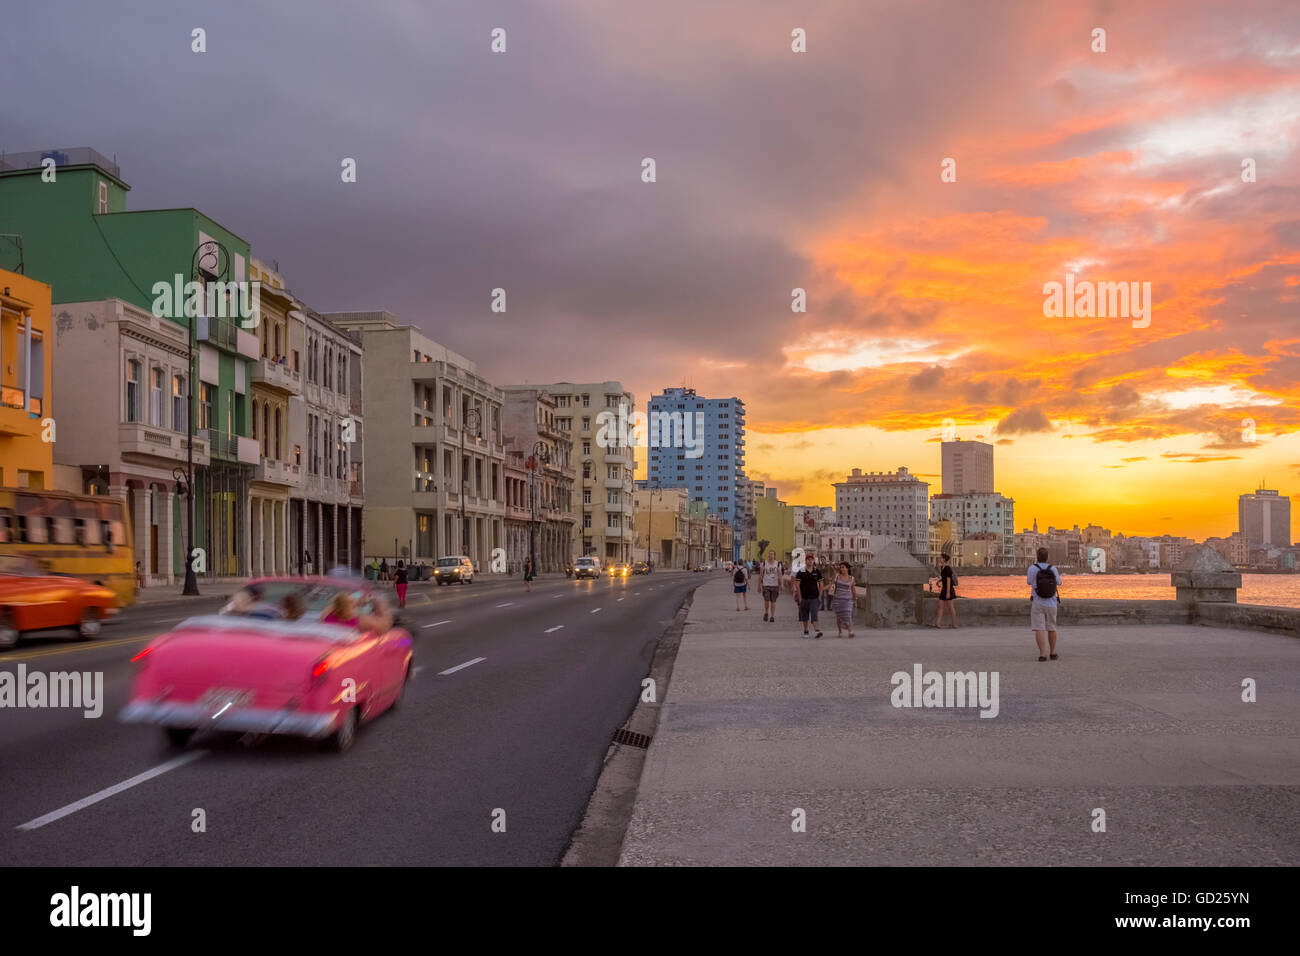 Der Malecon, Havanna, Kuba, Karibik, Karibik, Mittelamerika Stockbild